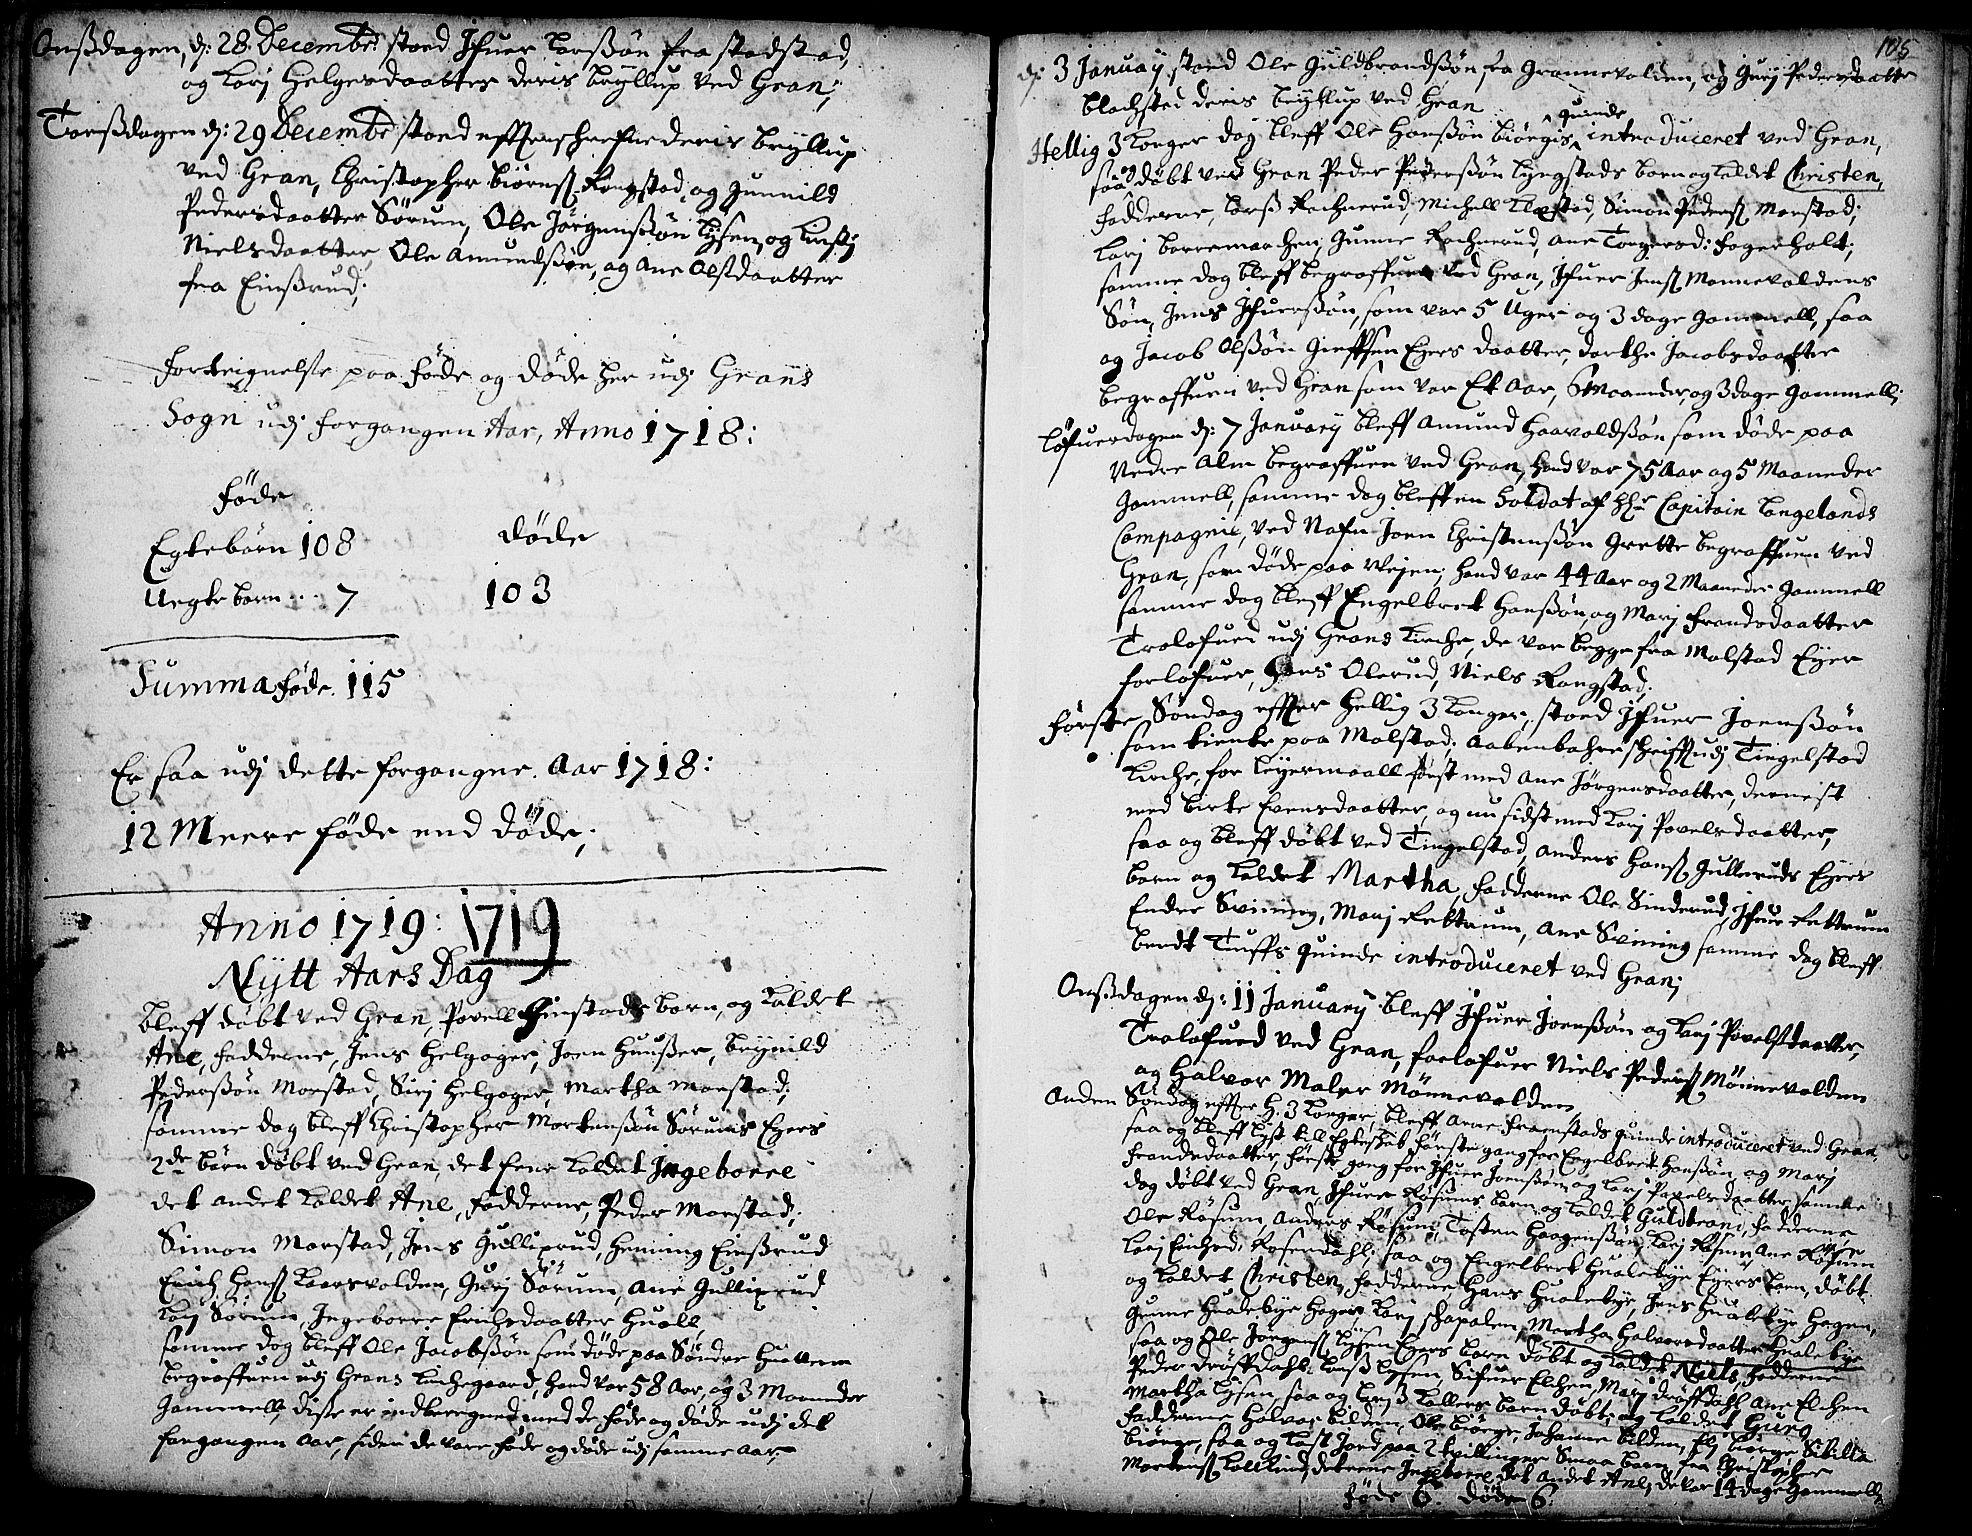 SAH, Gran prestekontor, Ministerialbok nr. 1, 1707-1731, s. 105